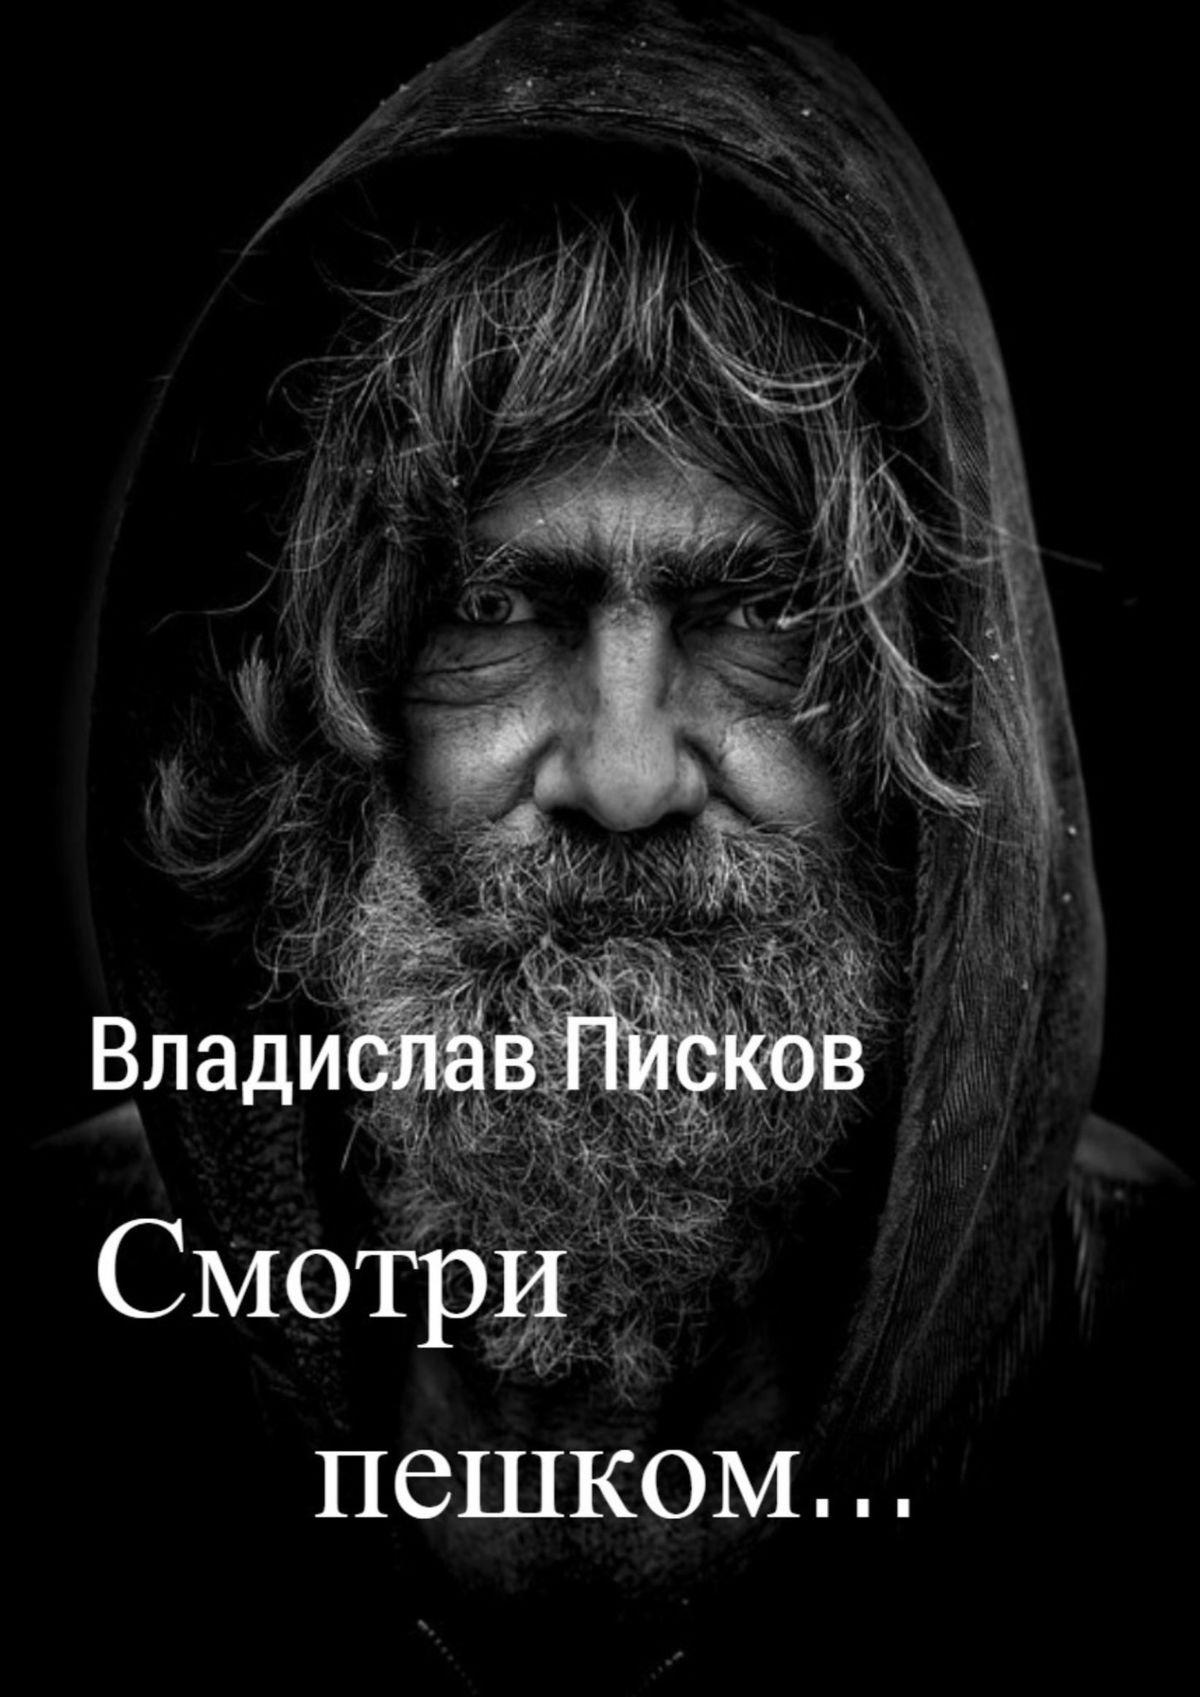 цена Владислав Писков Смотри пешком…